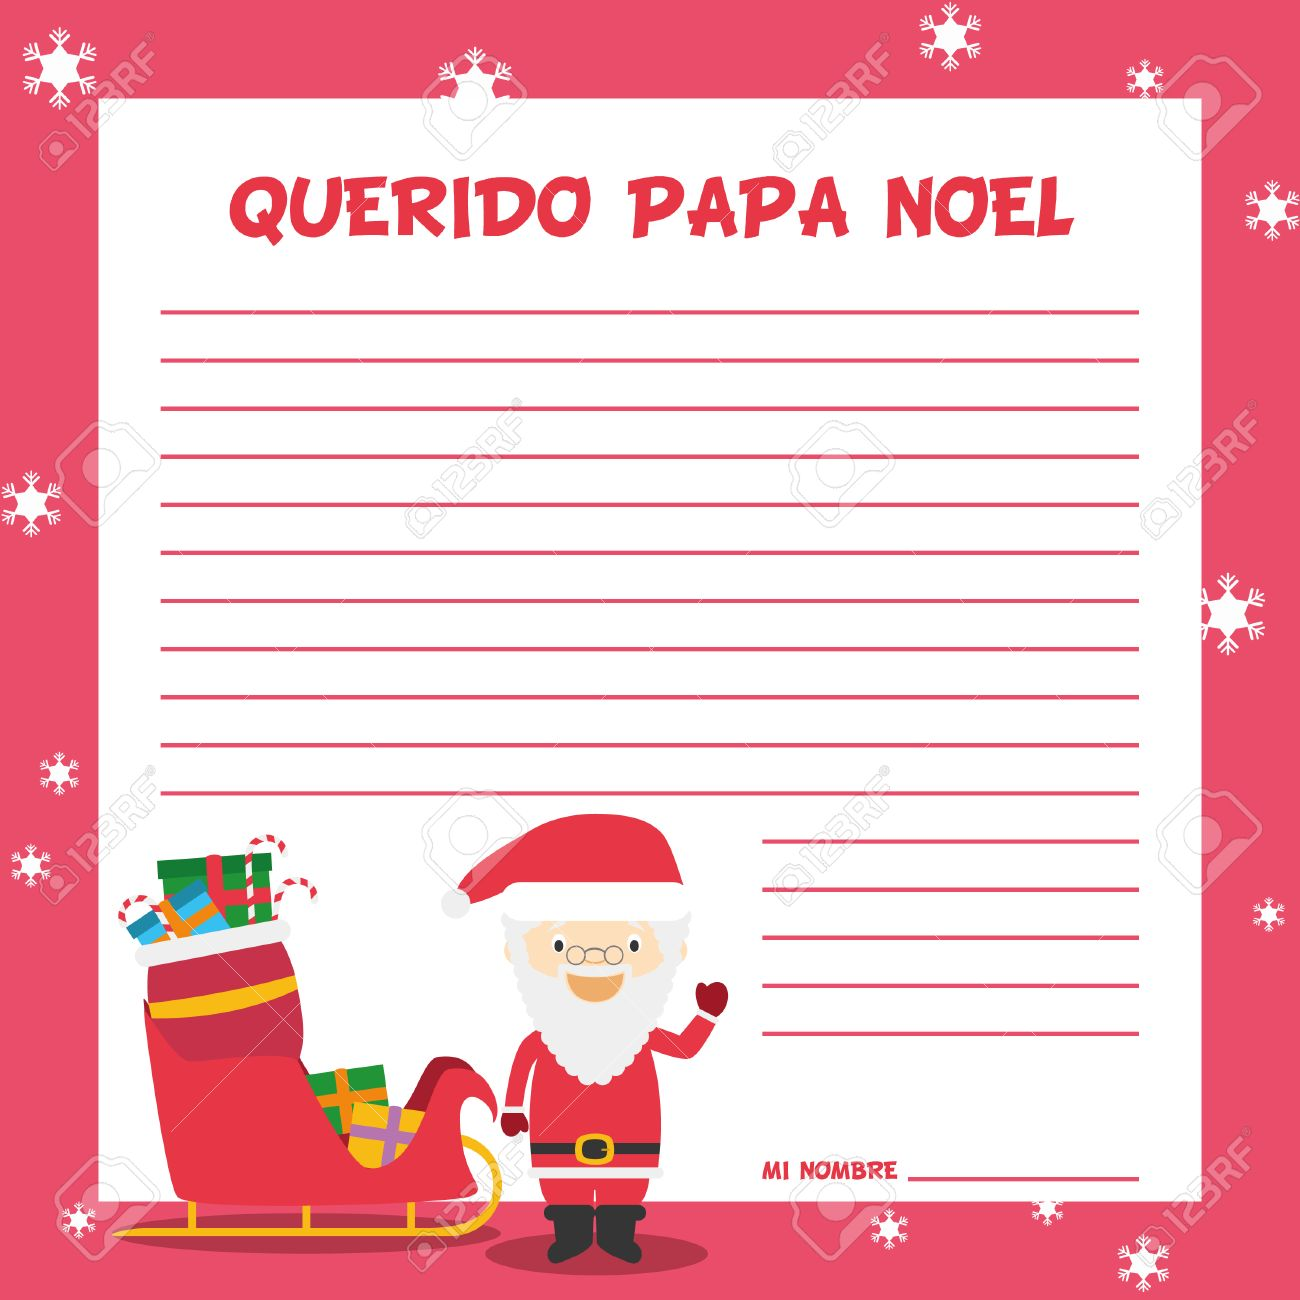 Santa Claus Letter Template Vector Illustration For Christmas - Santa claus letter template